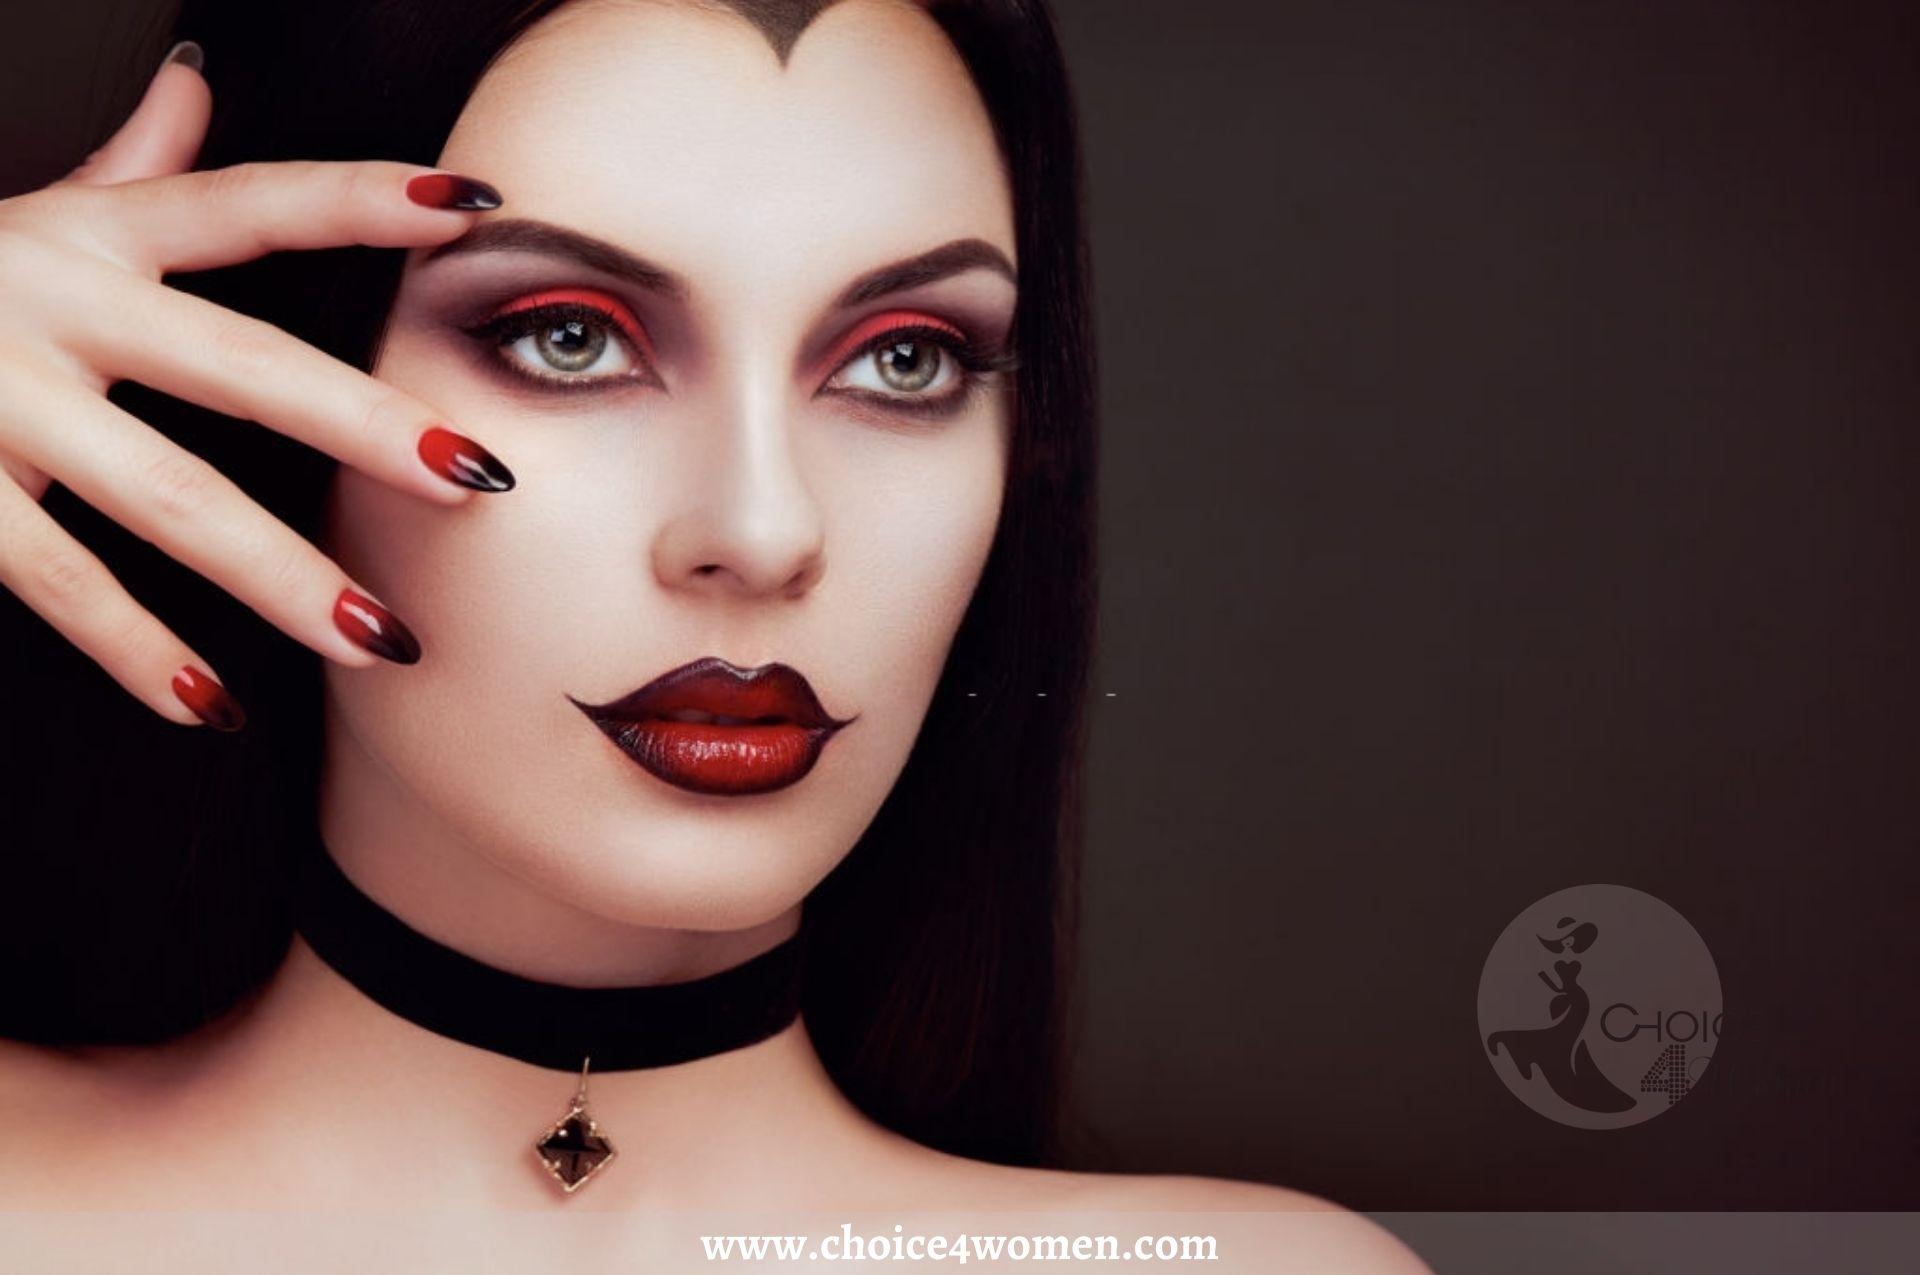 17 Inspiring Halloween Makeup Ideas to Try For Halloween Night